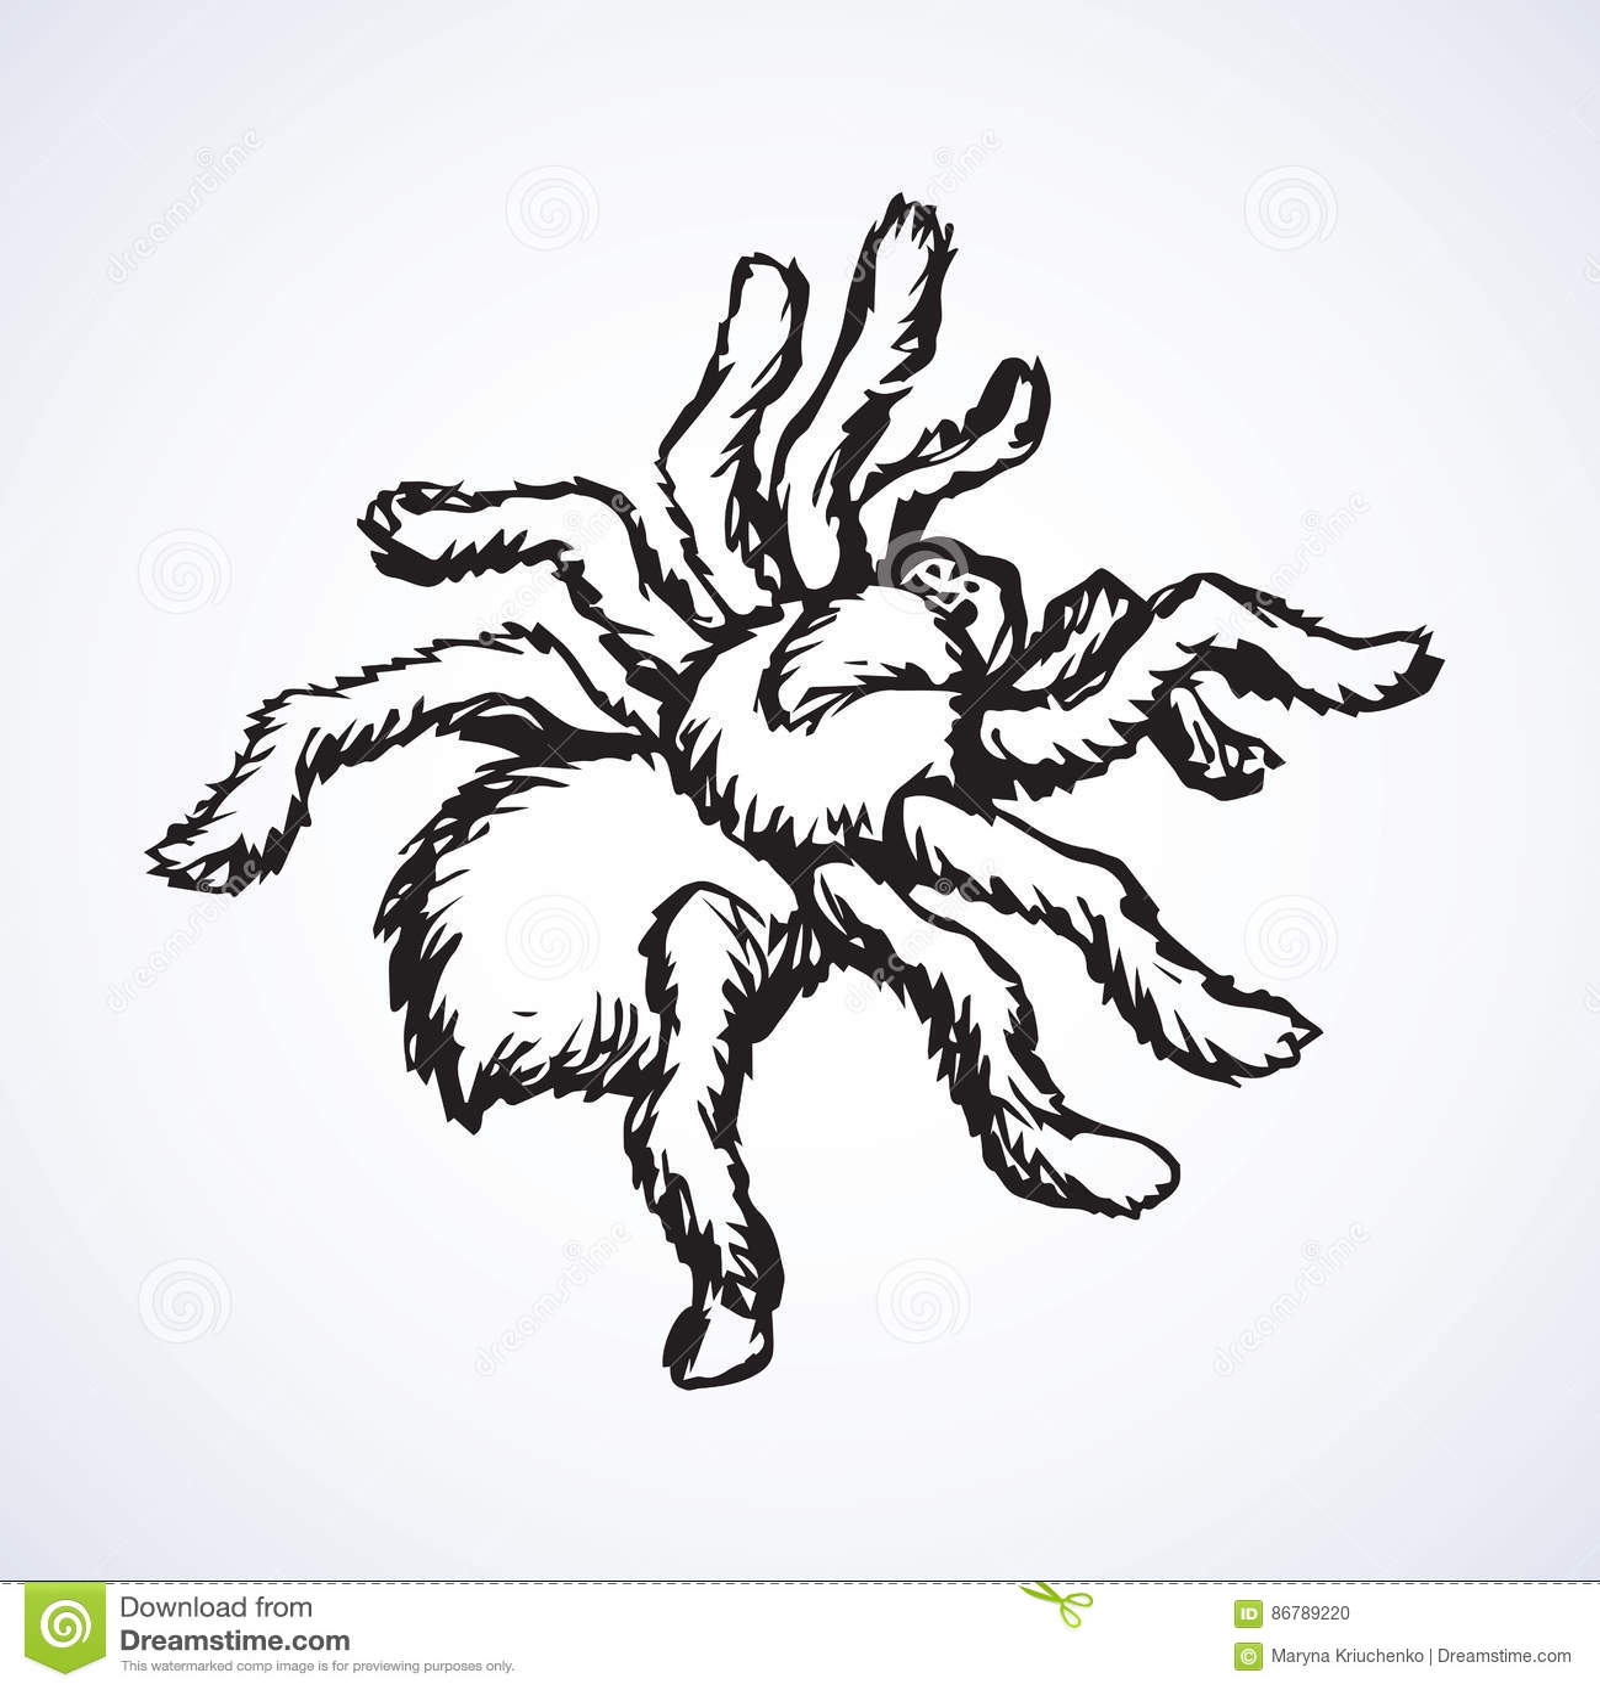 Vector Sketch Spider Vector Illustration